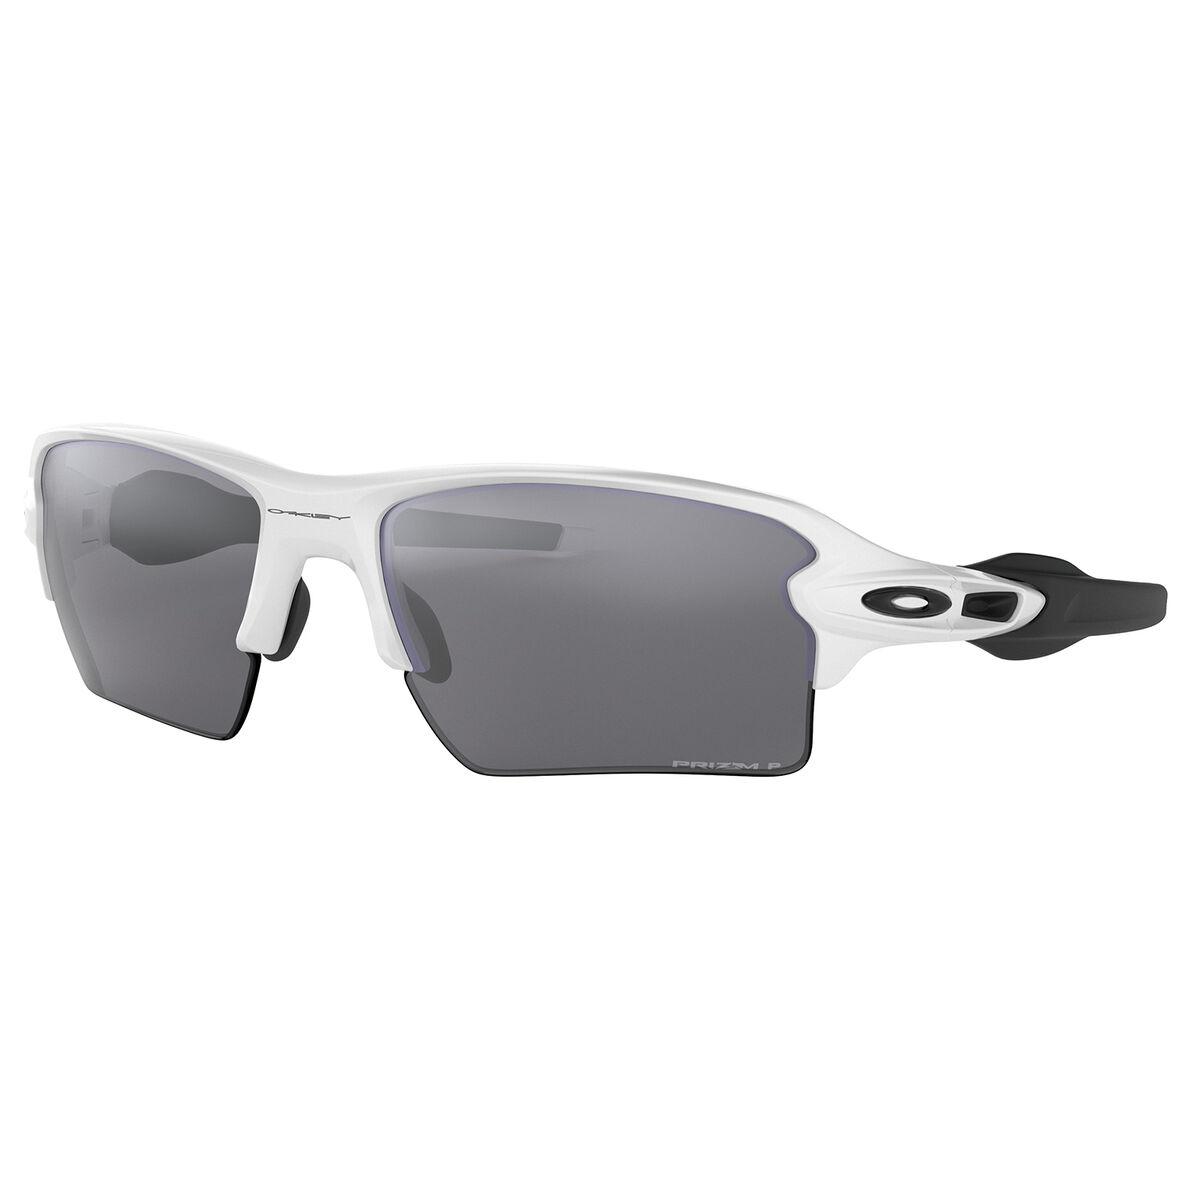 83c5f48ab1 Images. Oakley Flak 2.0 XL Prizm Polarized Sunglasses